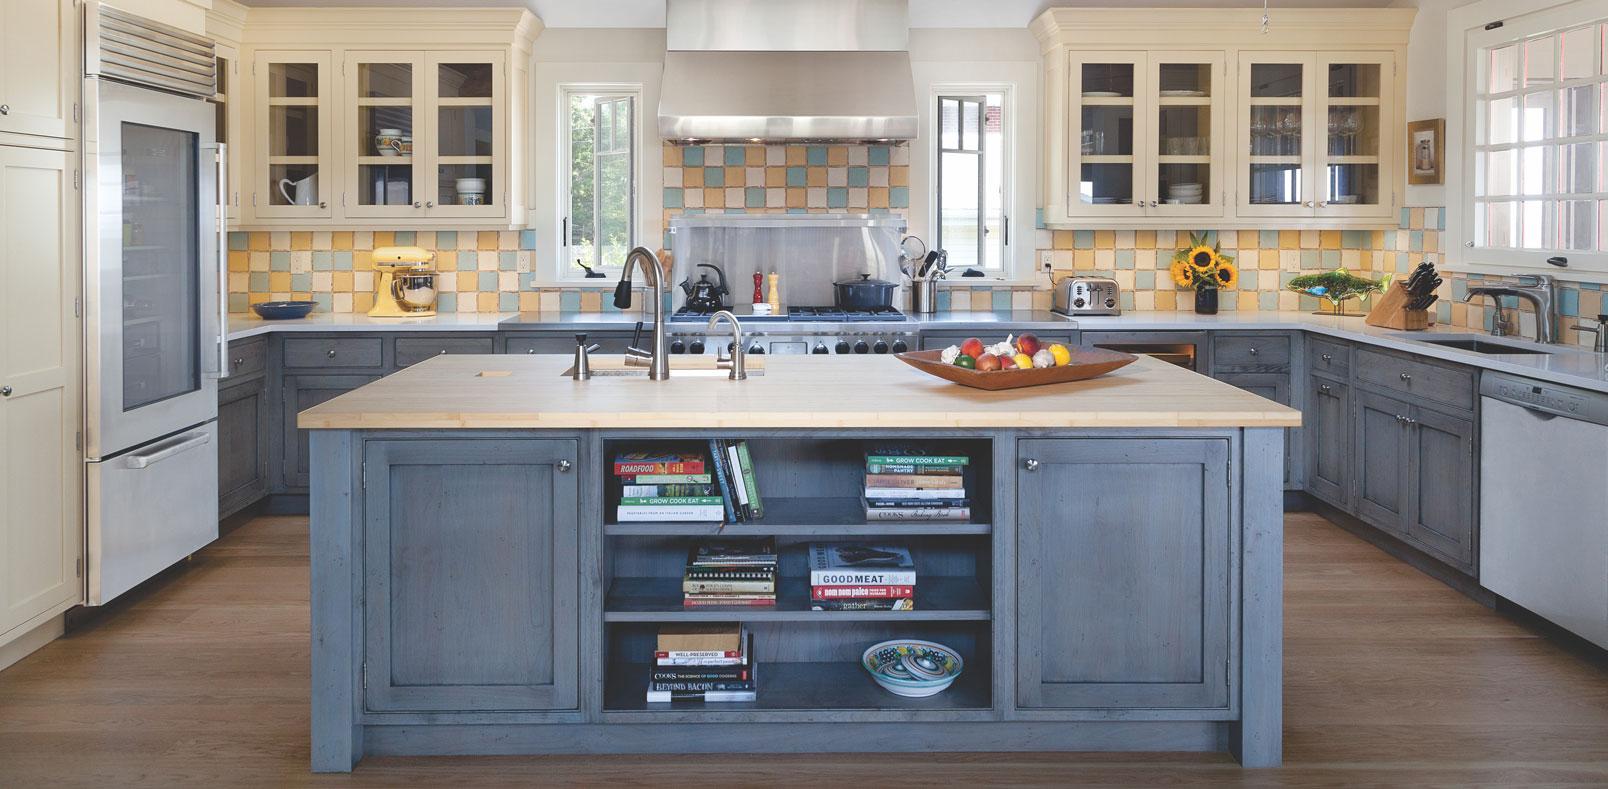 Kitchen Cabinets Long Island LAKEVILLE KITCHEN & BATH